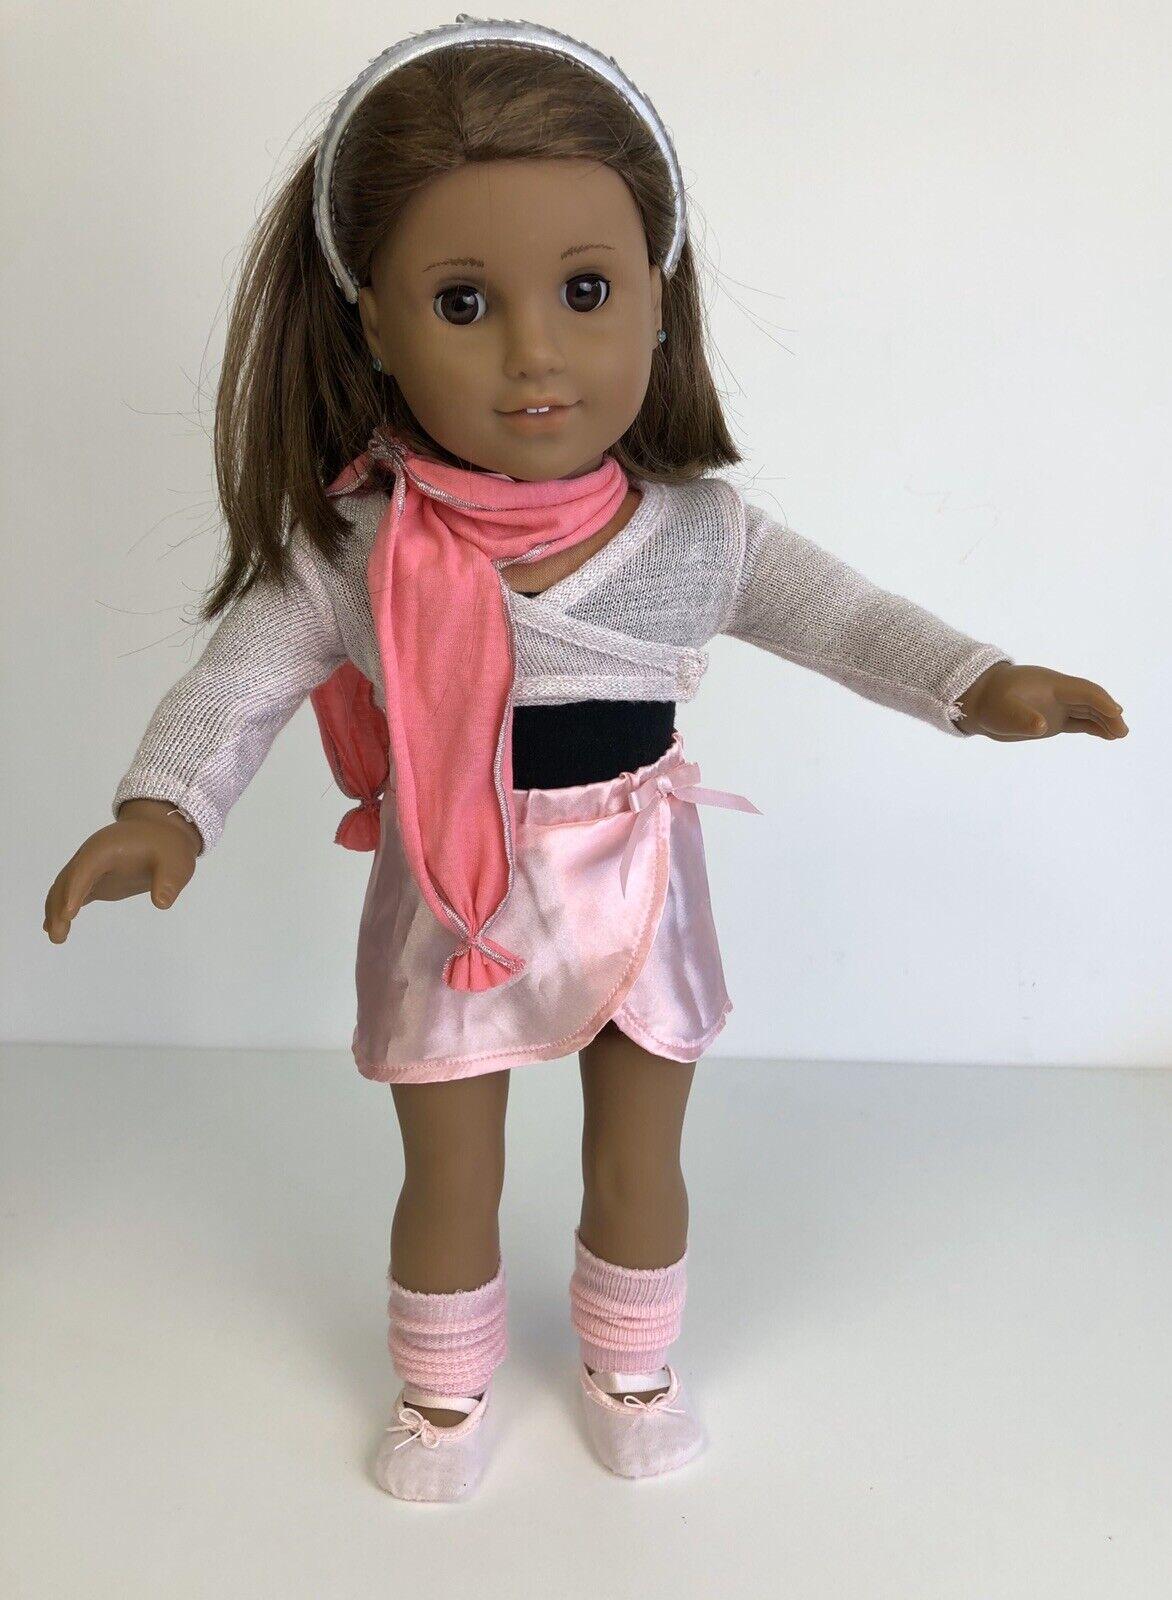 American Girl Doll VGC dark Hair Pierced Ears. In A Delightful Ballet Outfit.